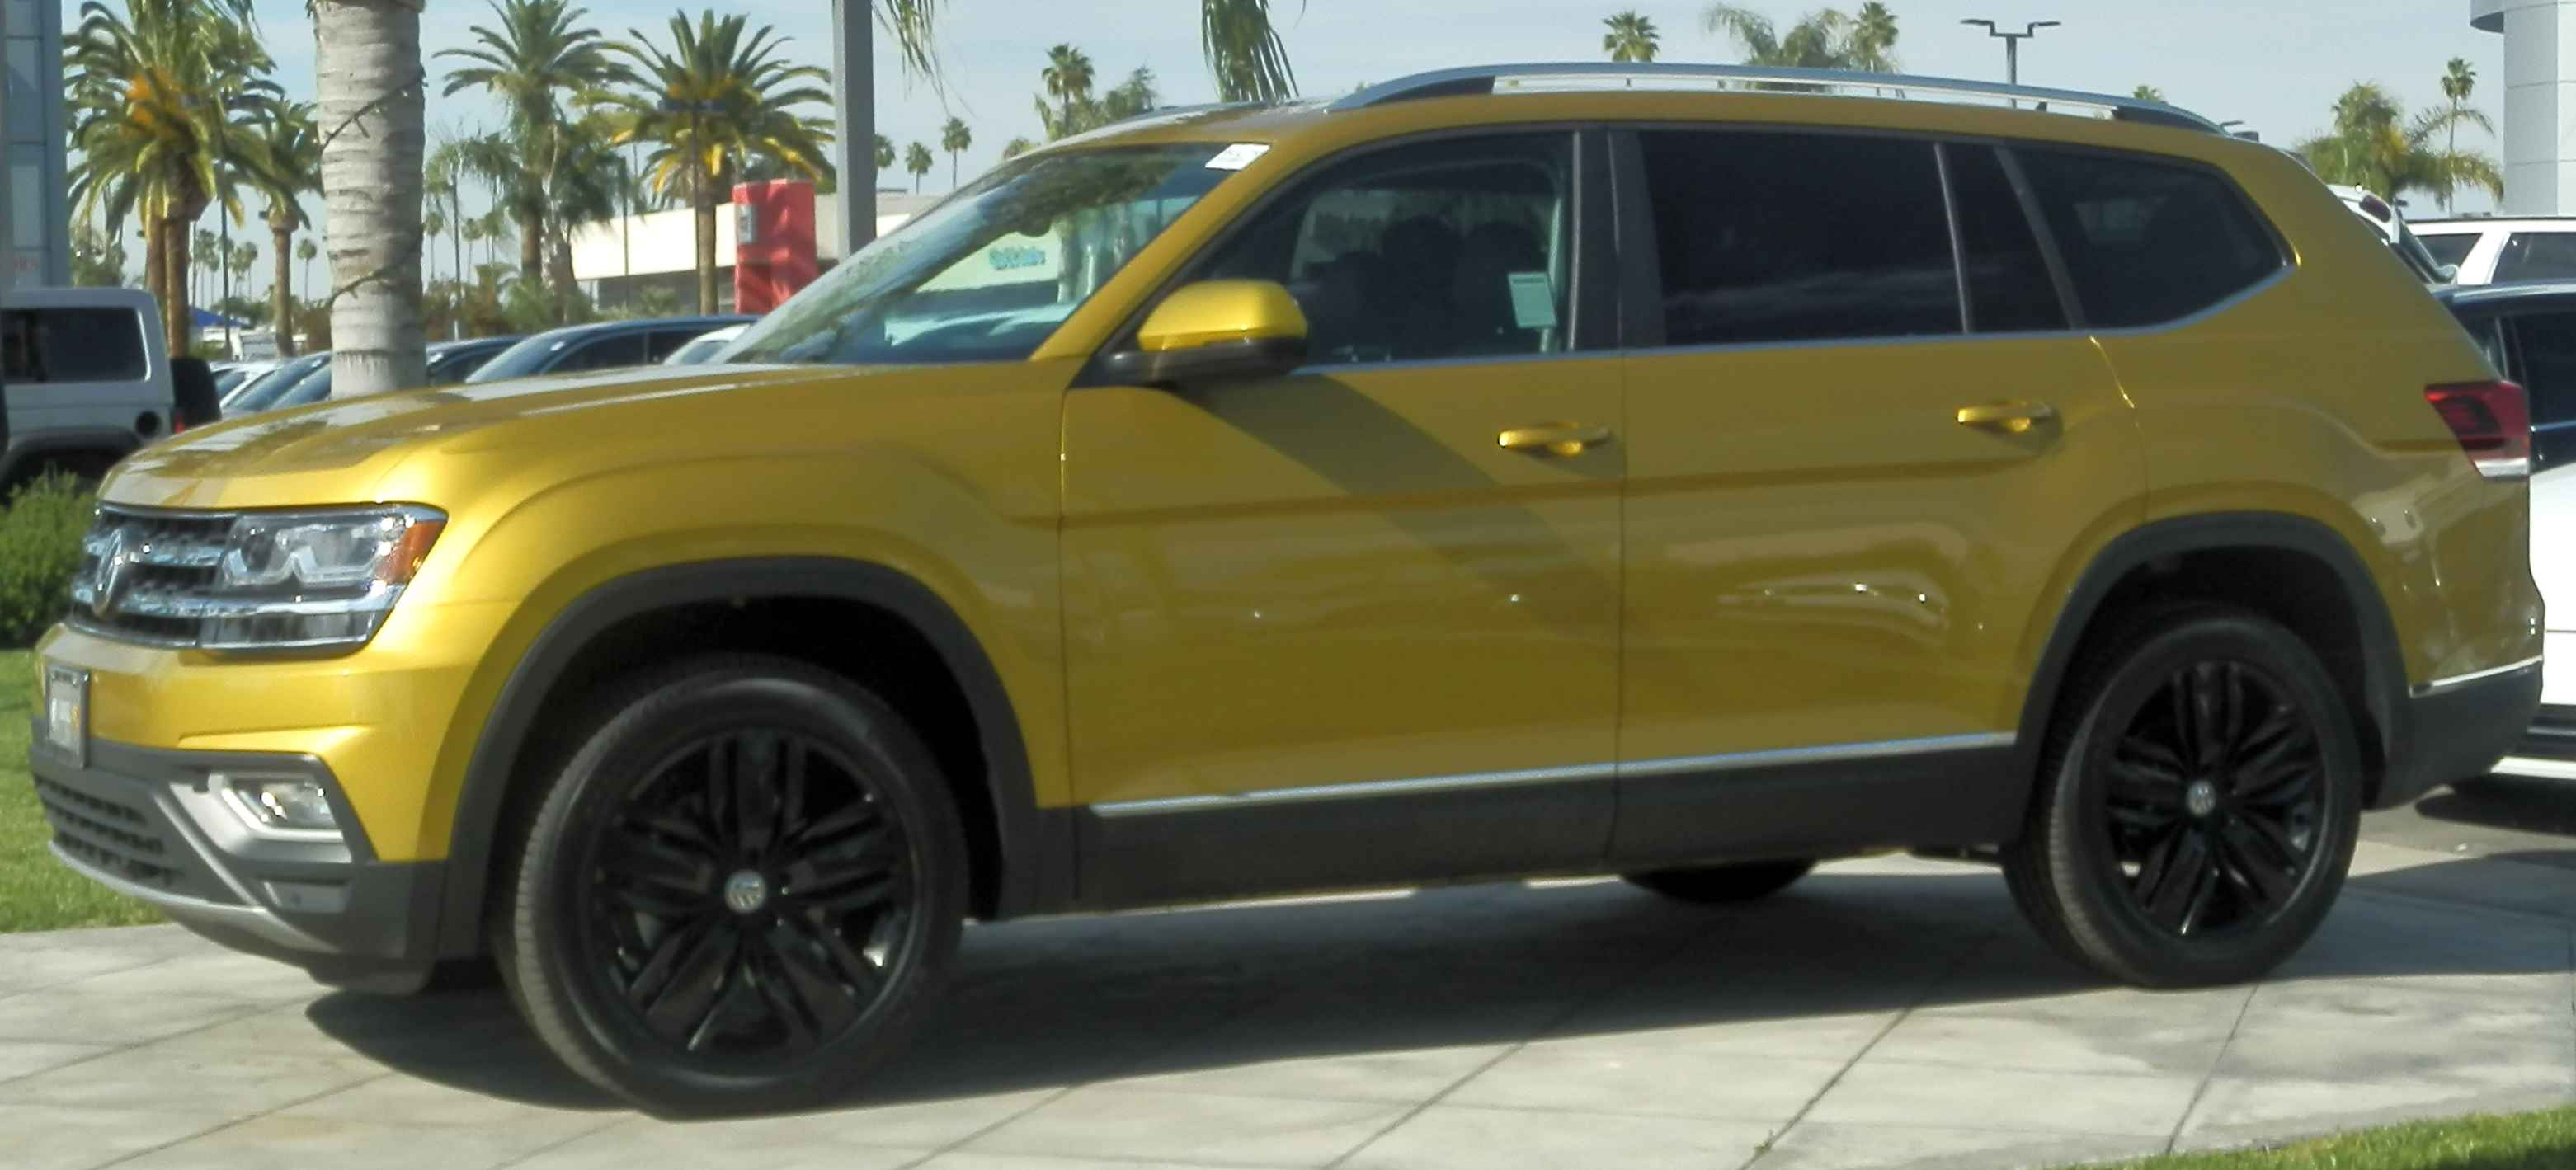 Vw Atlas Wiki | 2020 Upcoming Car Release